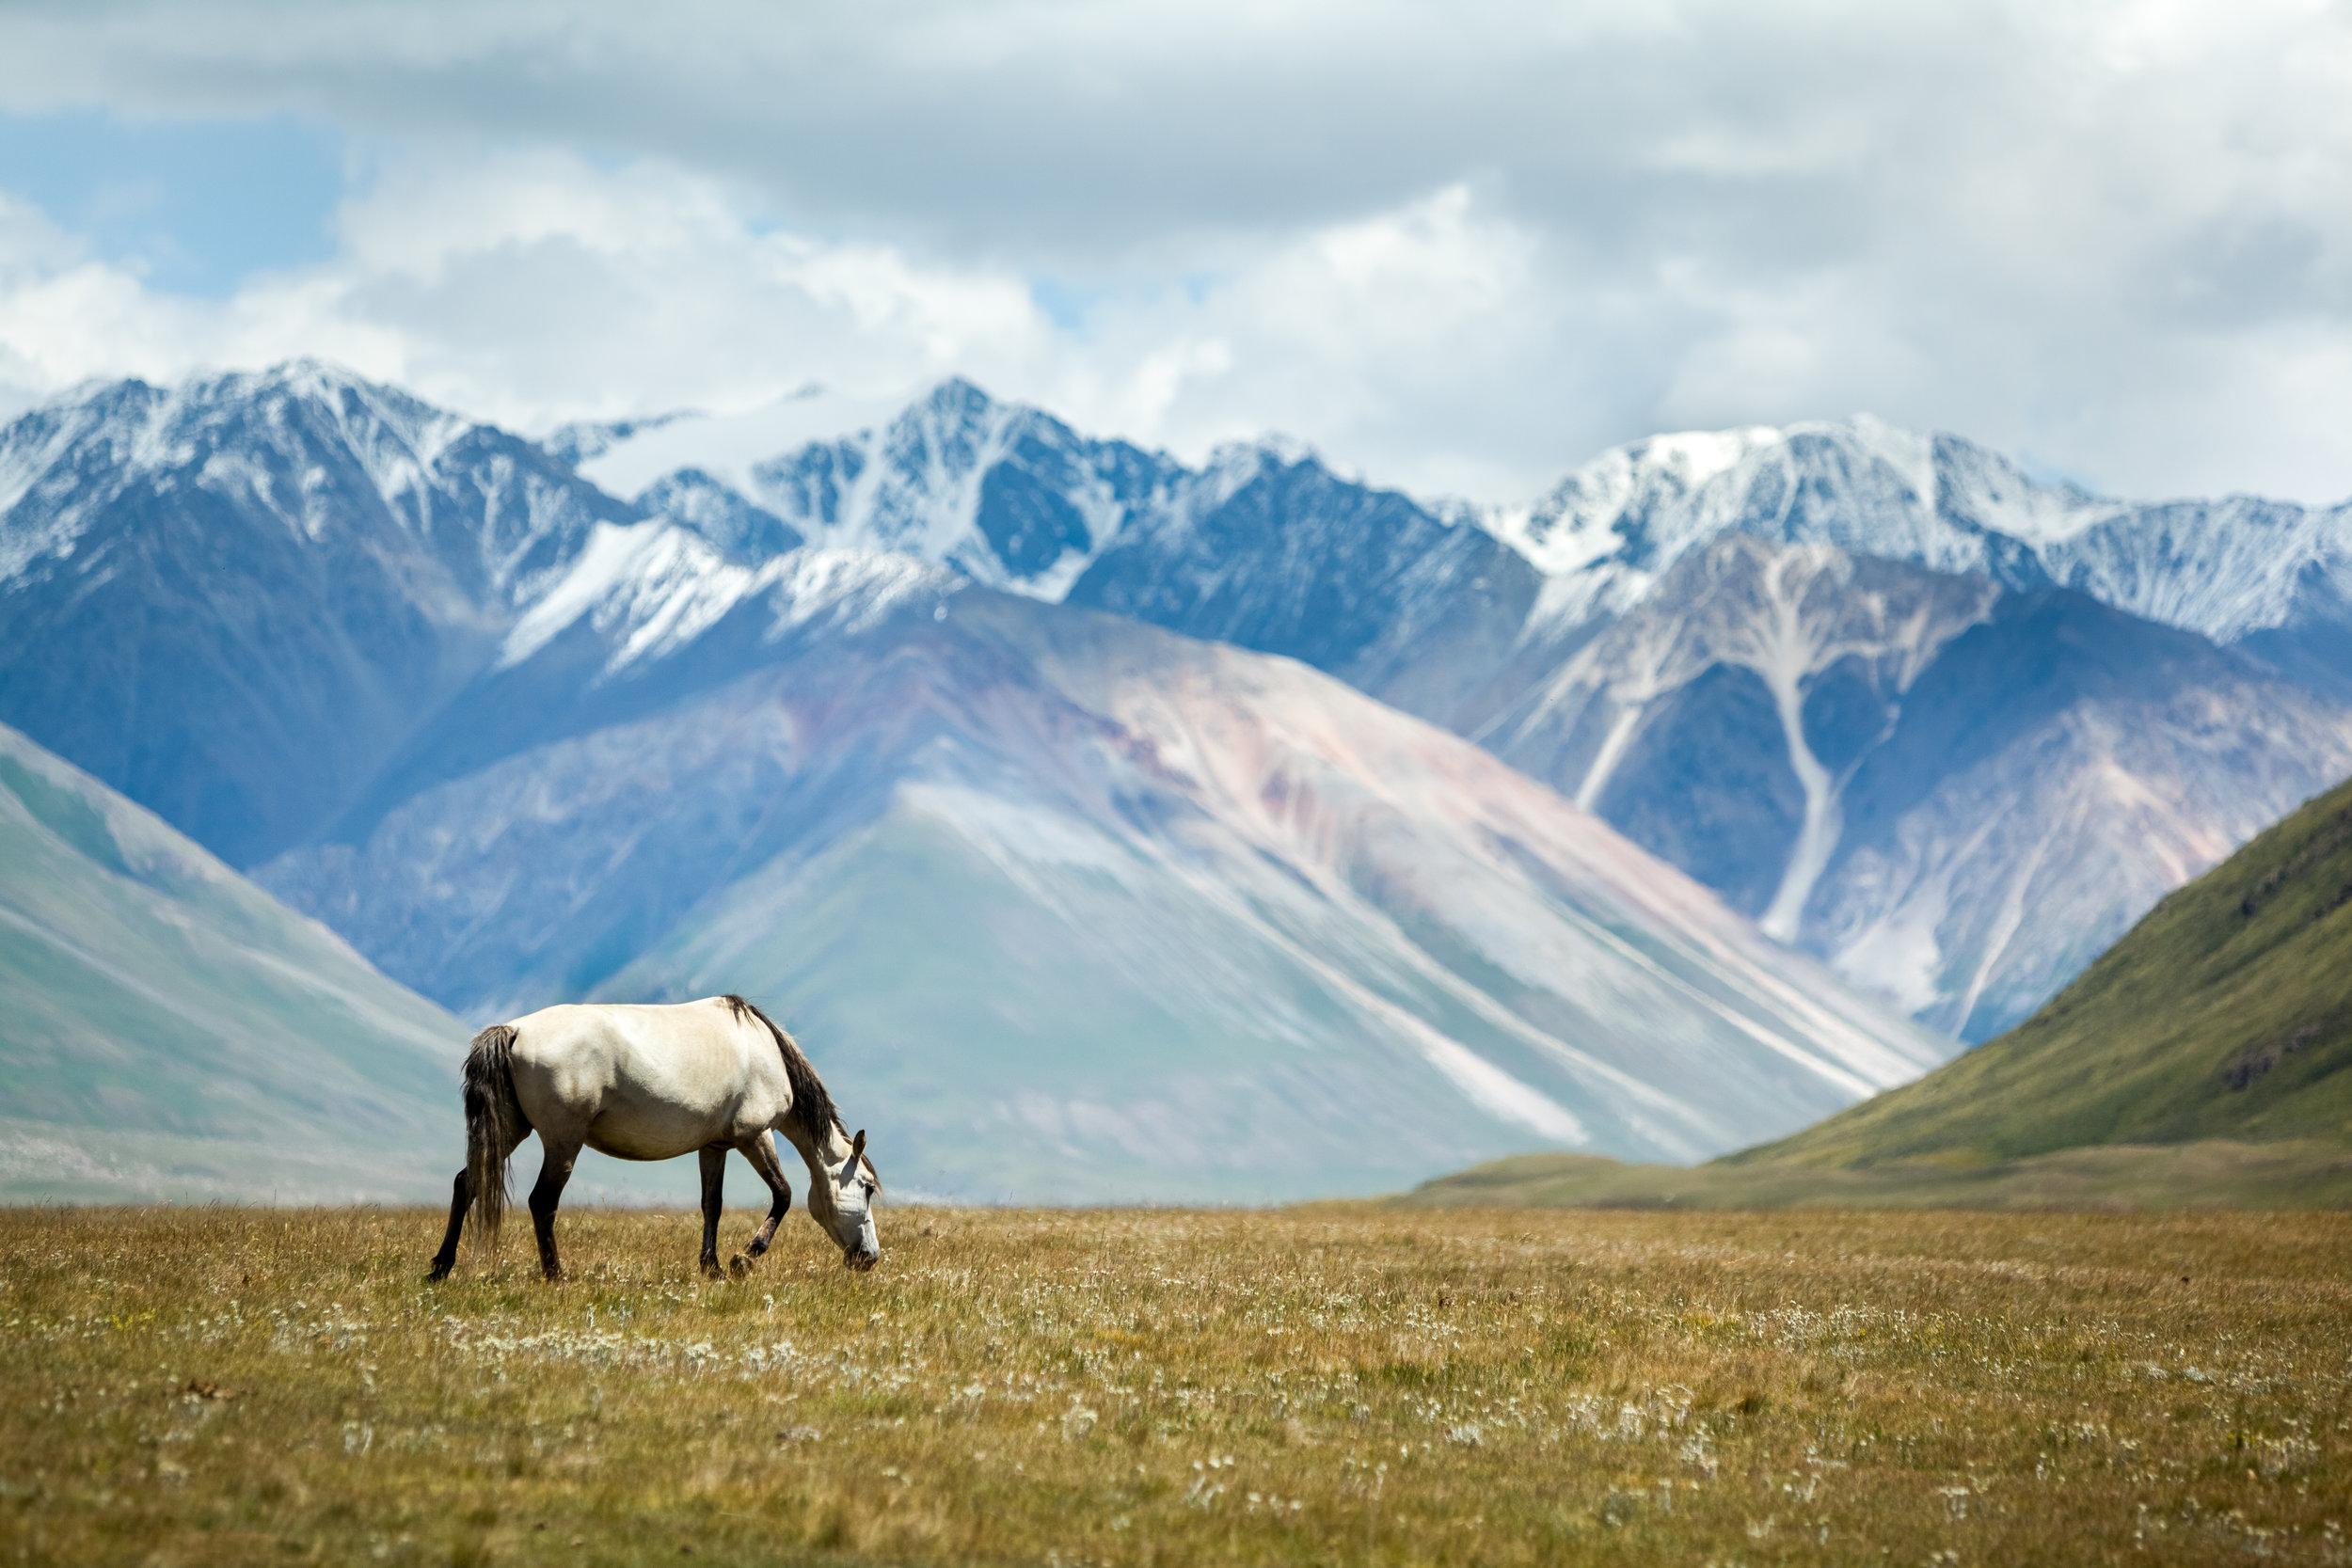 Eventyrlandet Nepal ligger mellom skyhøye Himalayatopper, dyp jungel, vaiende bønneflagg